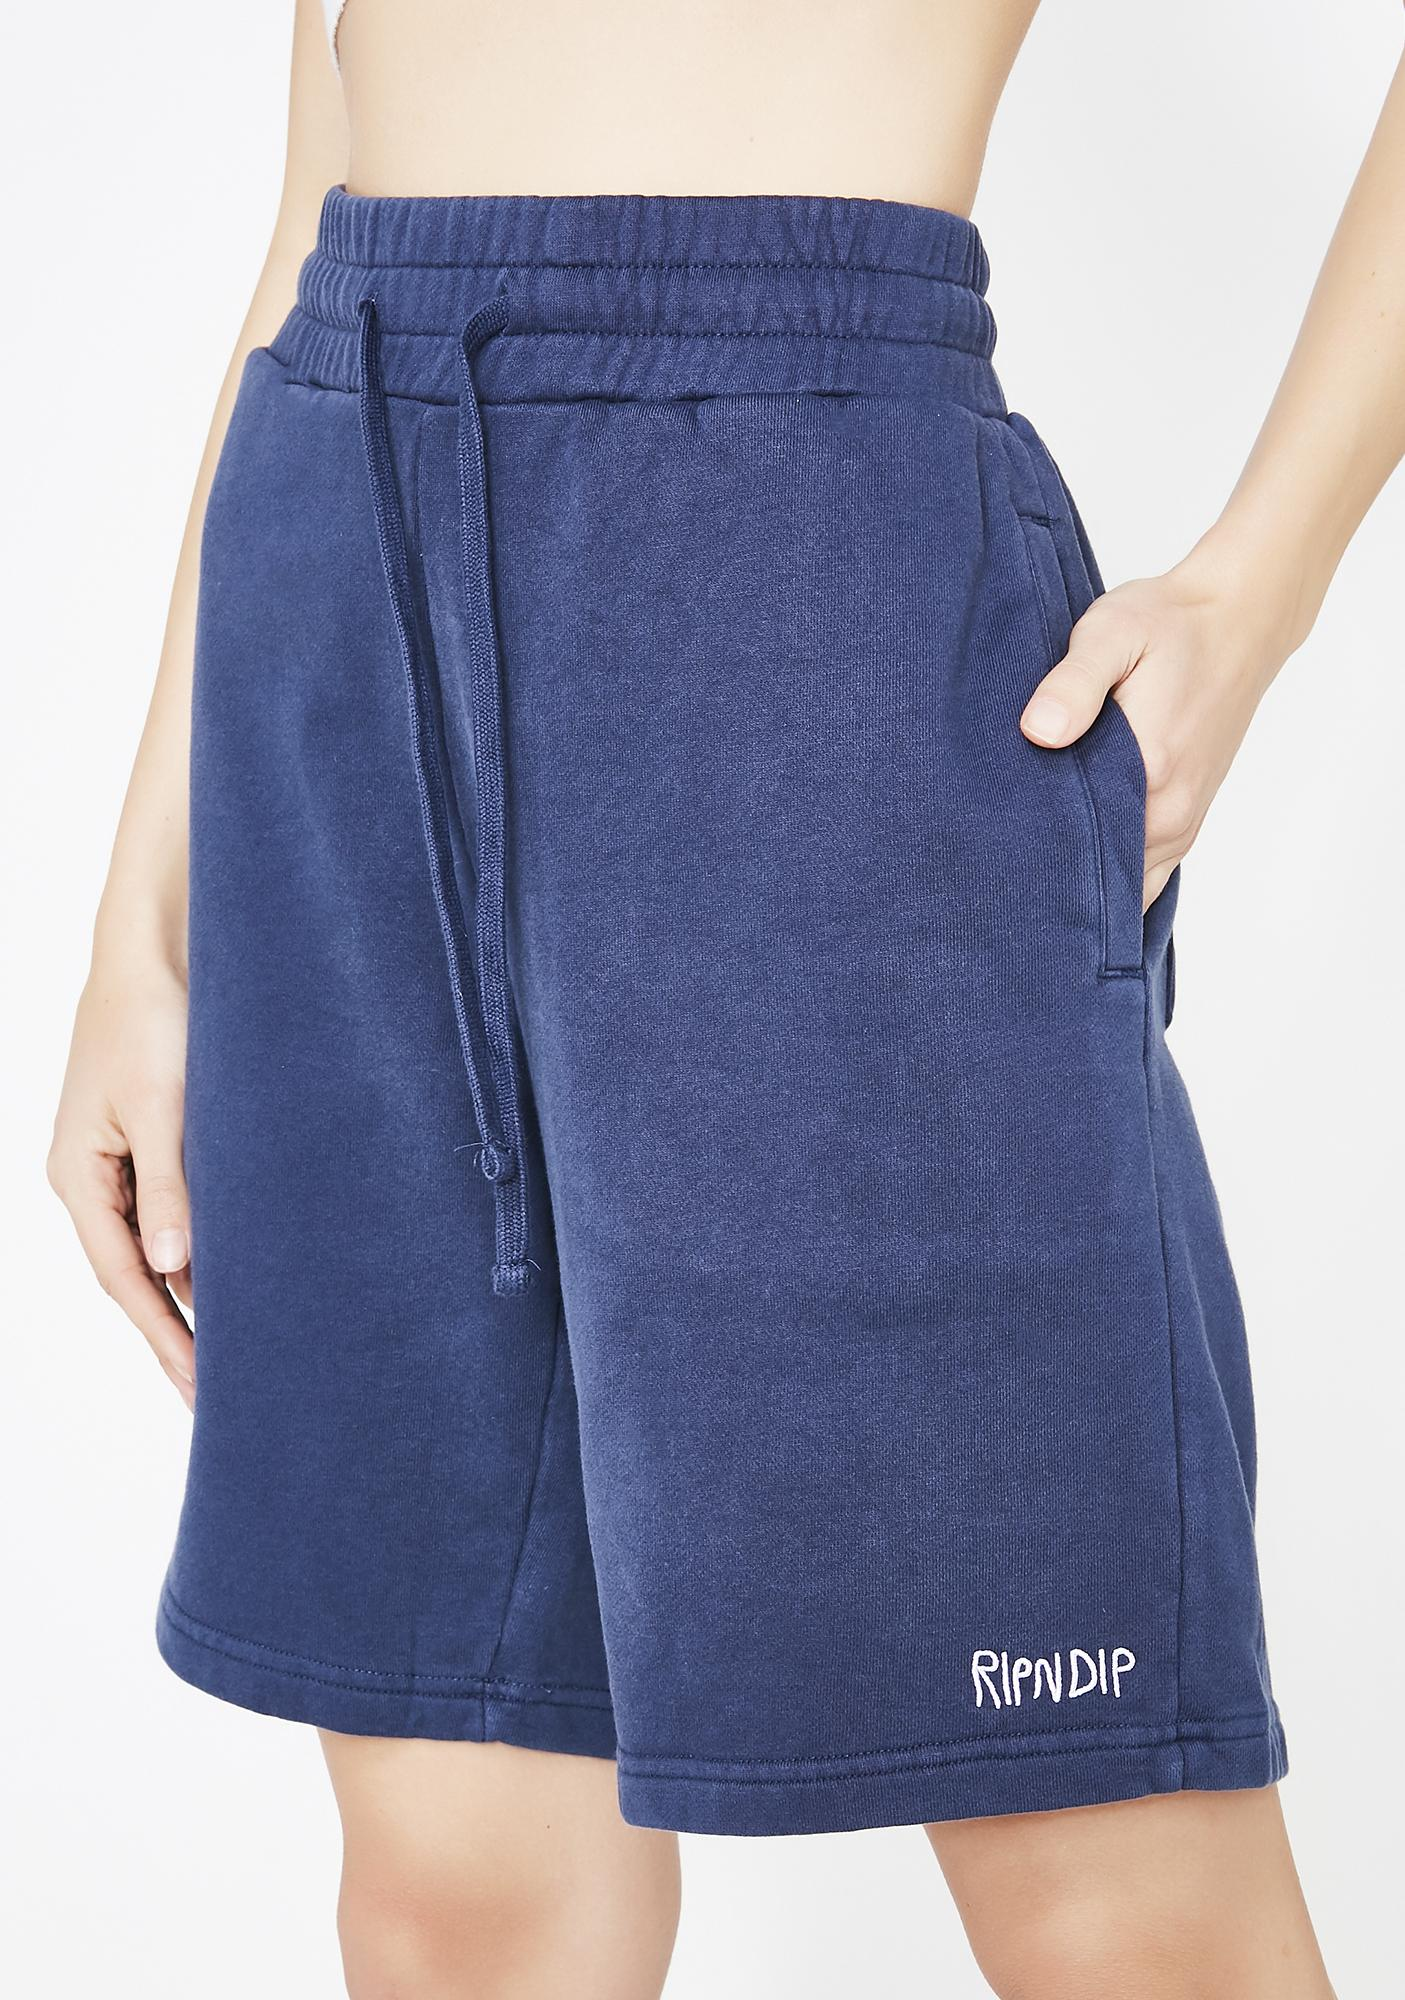 RIPNDIP Royal Peek A Nermal Sweat Shorts